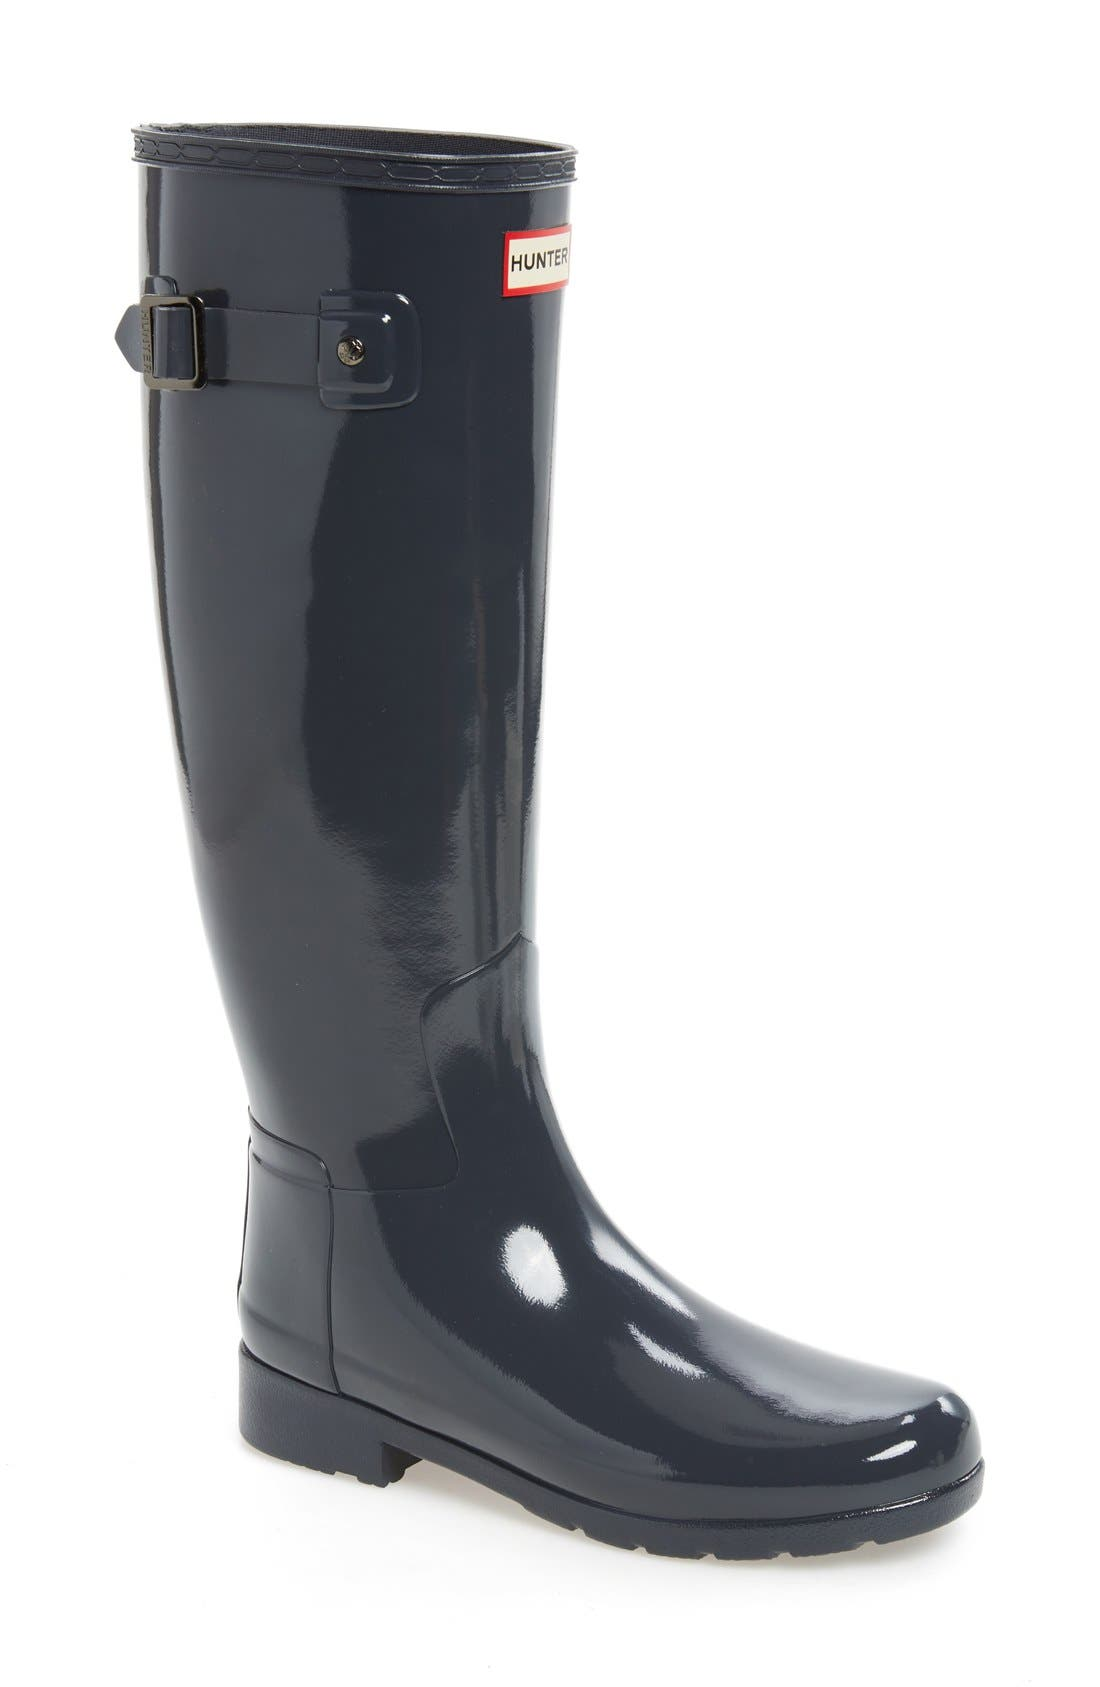 Alternate Image 1 Selected - Hunter 'Original Refined' High Gloss Rain Boot (Women)